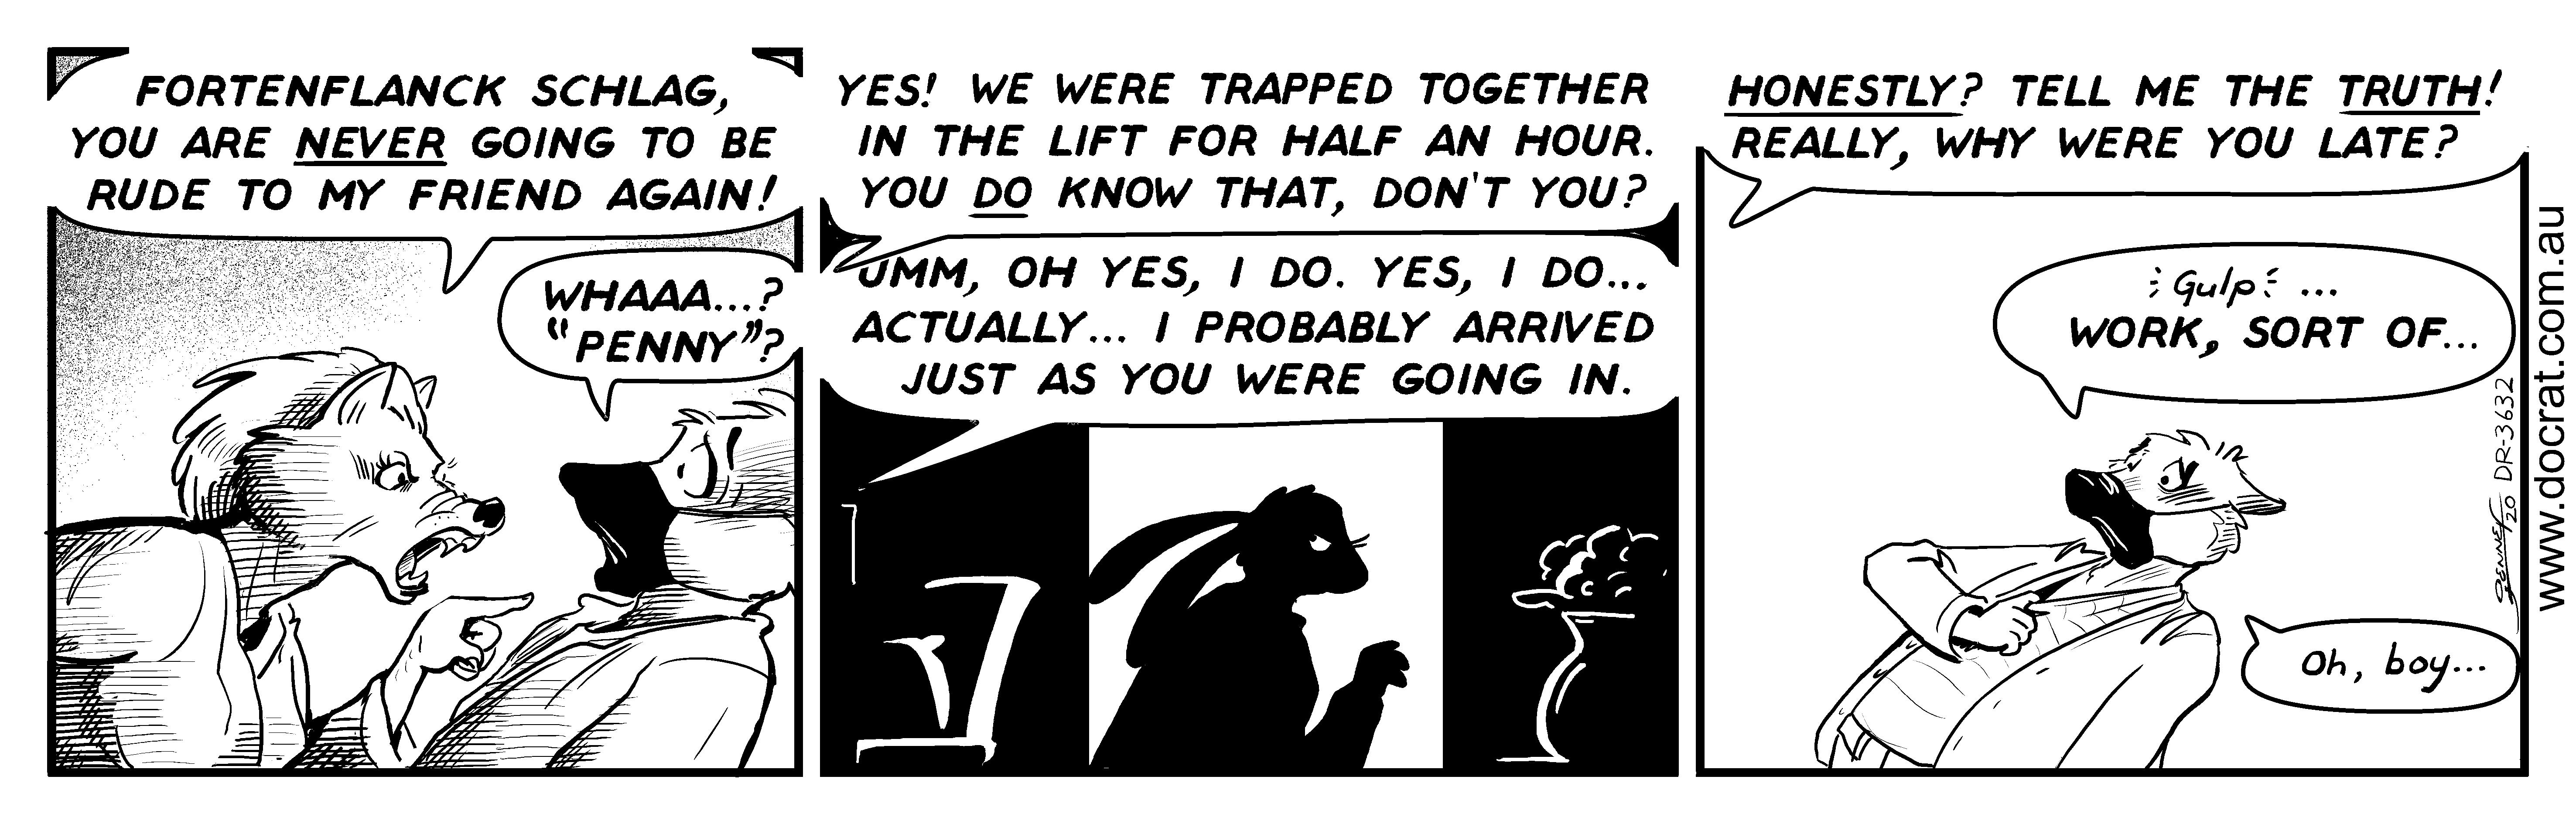 20201215